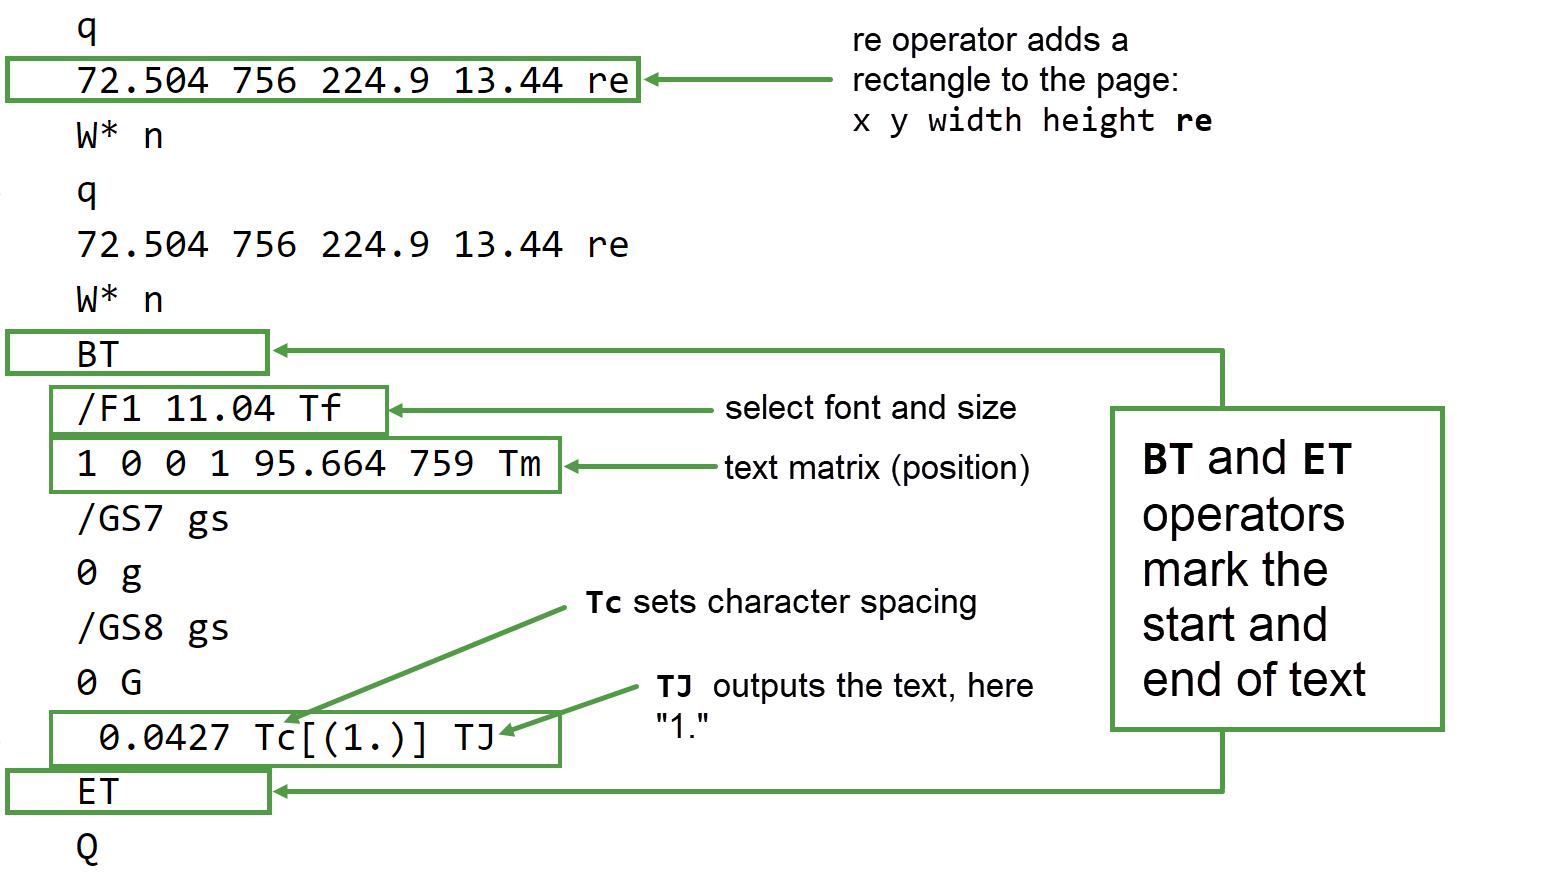 Image of content stream in a PDF file